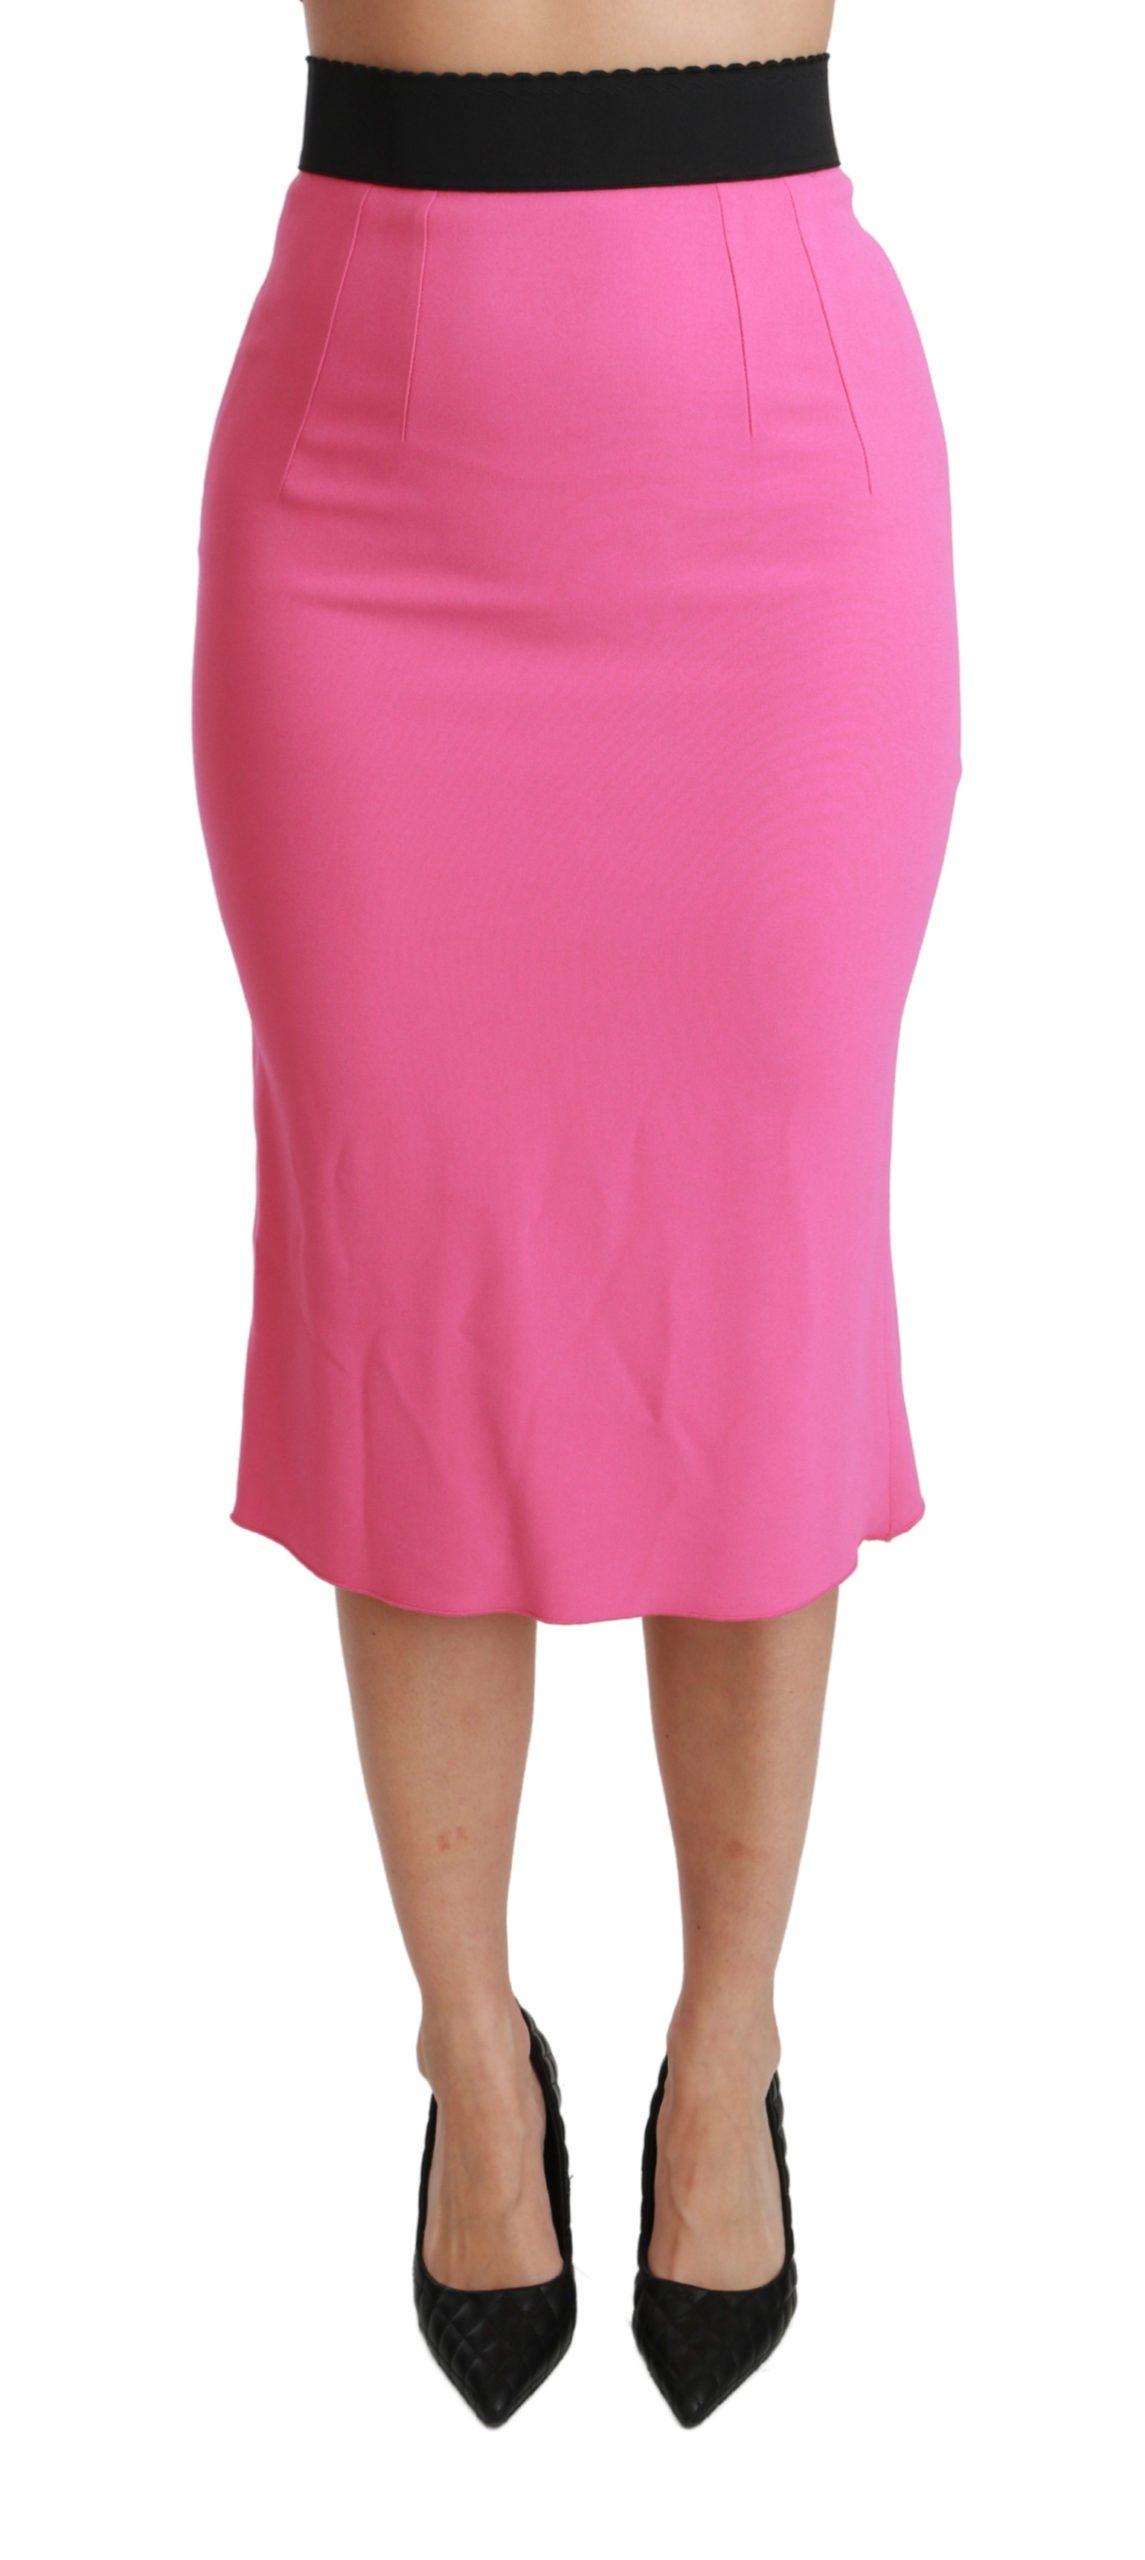 Dolce & Gabbana Women's High Waist Viscose Skirt Pink SKI1413 - IT38|XS